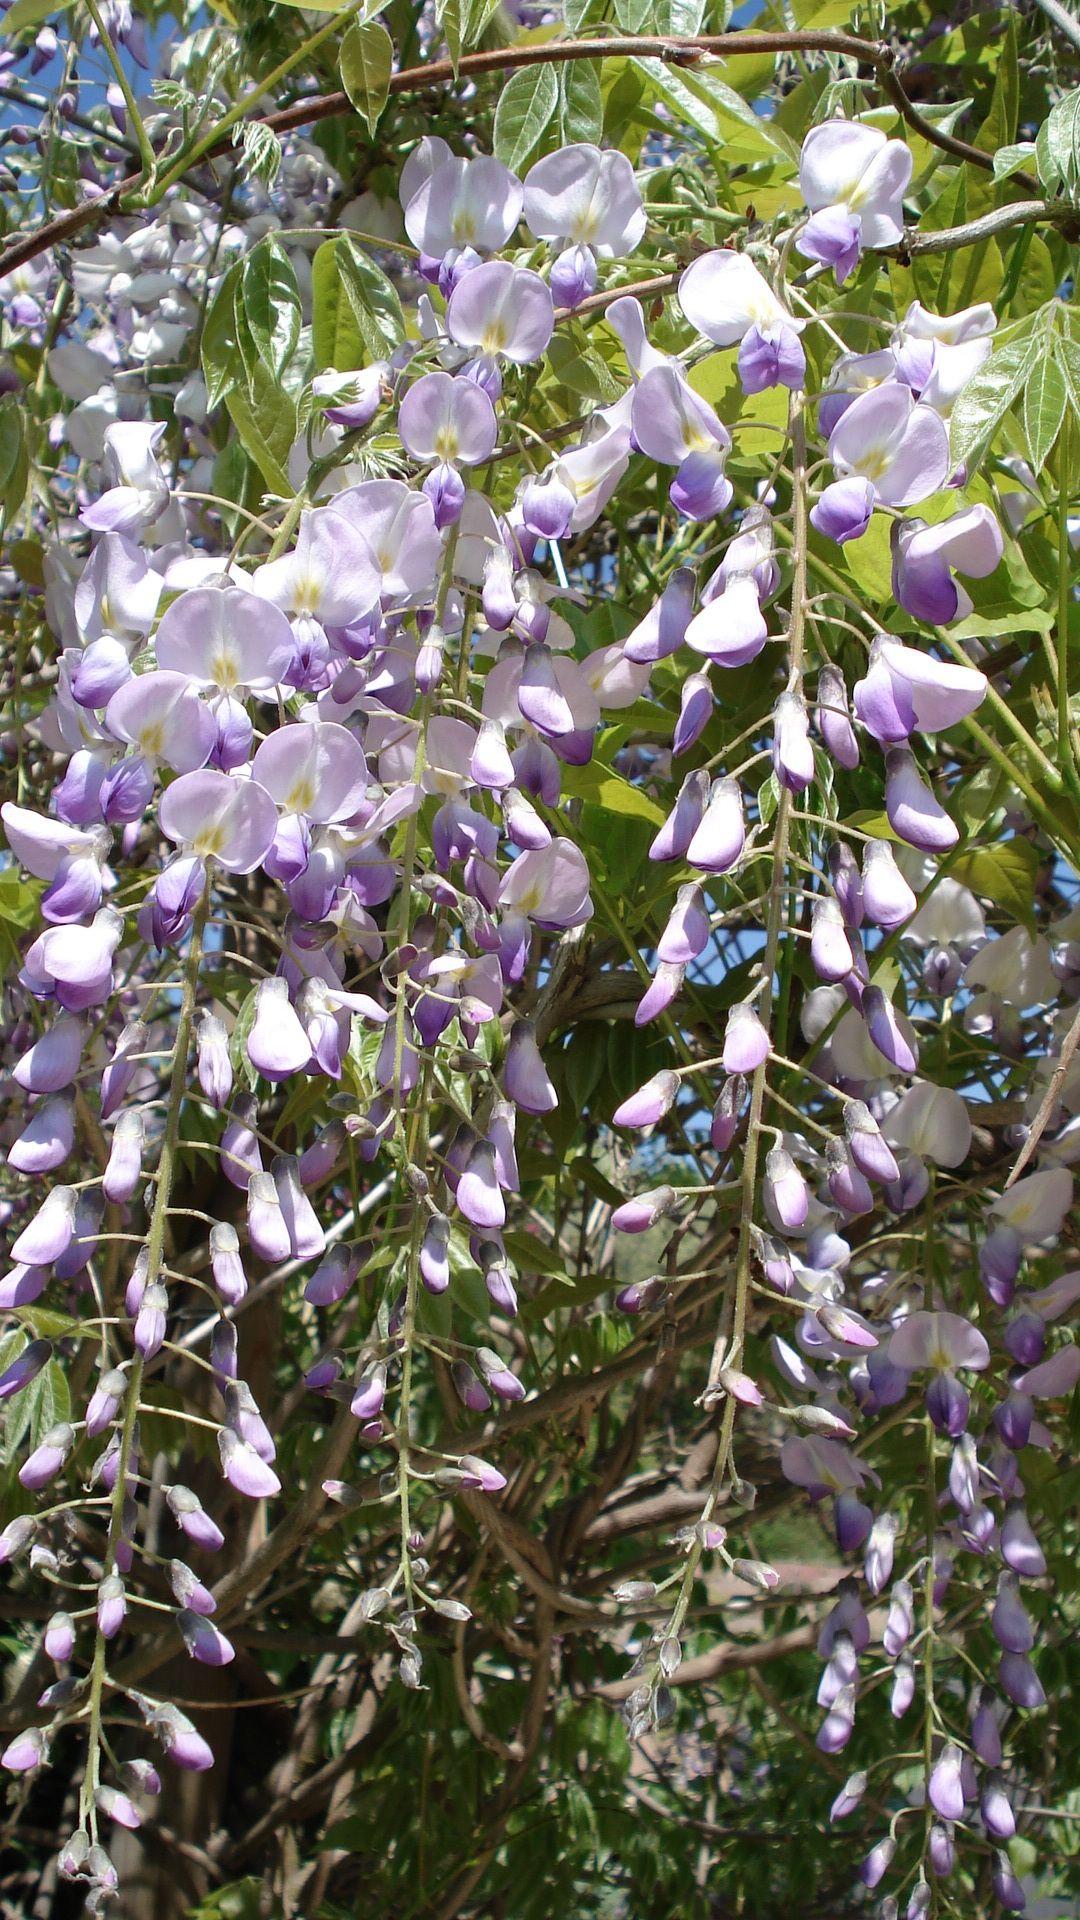 Mon jardinma passion mon jardinma passion pinterest wisteria